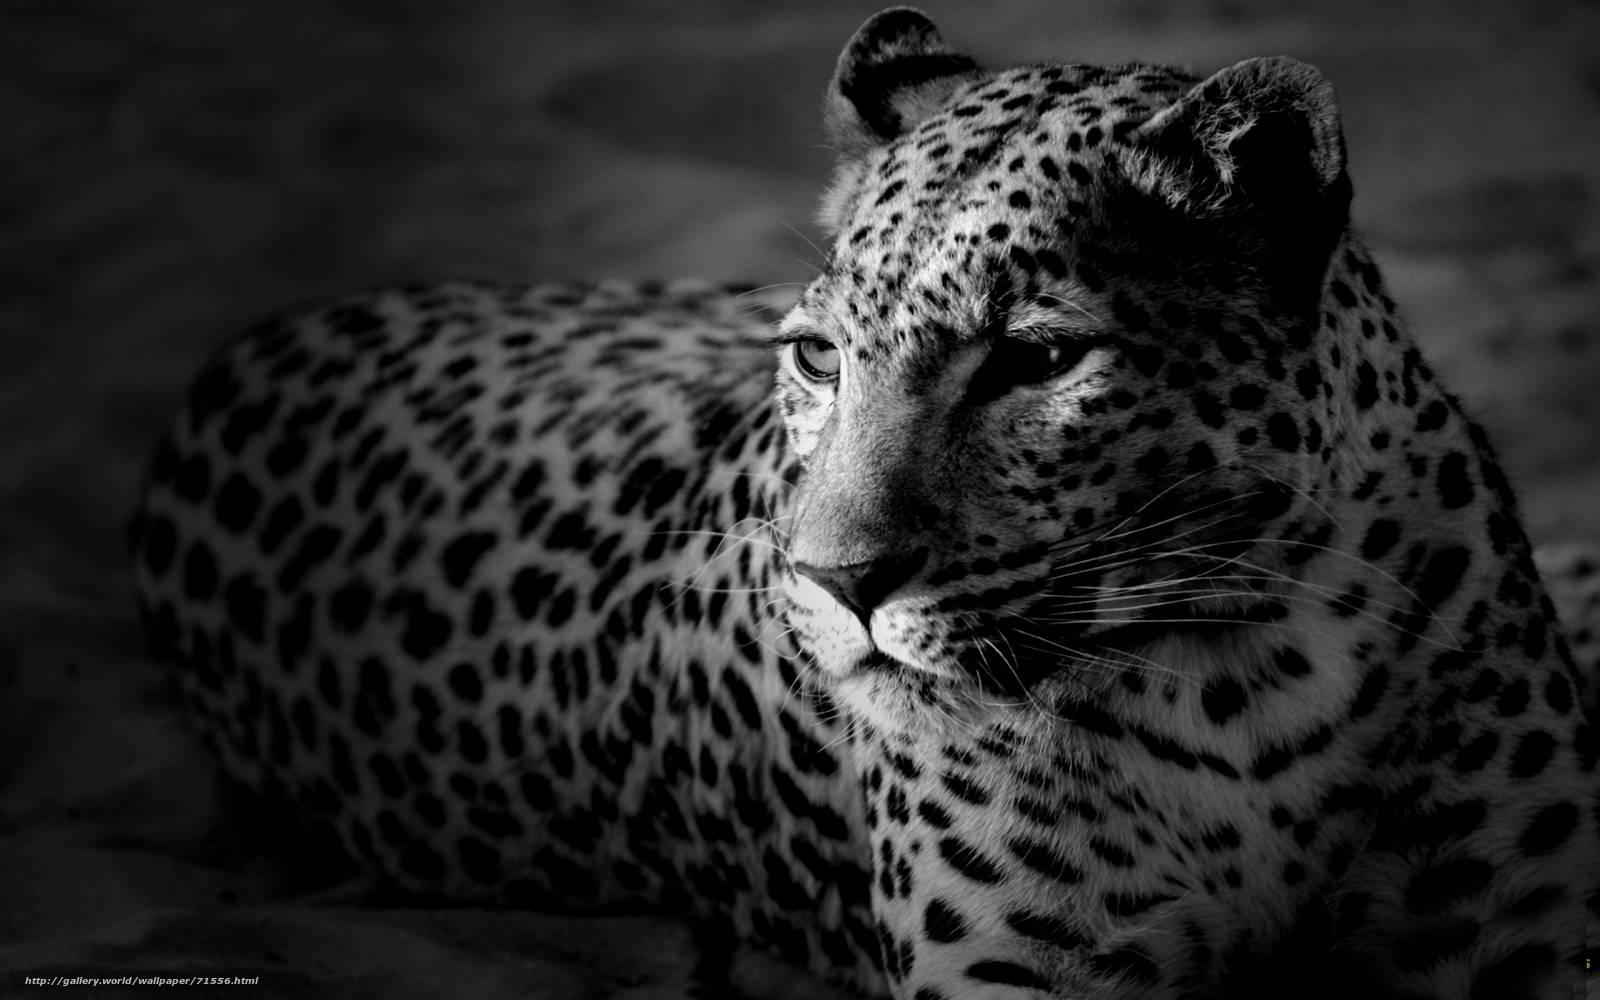 Обои картинки фото леопард, морда, черно-белые обои.